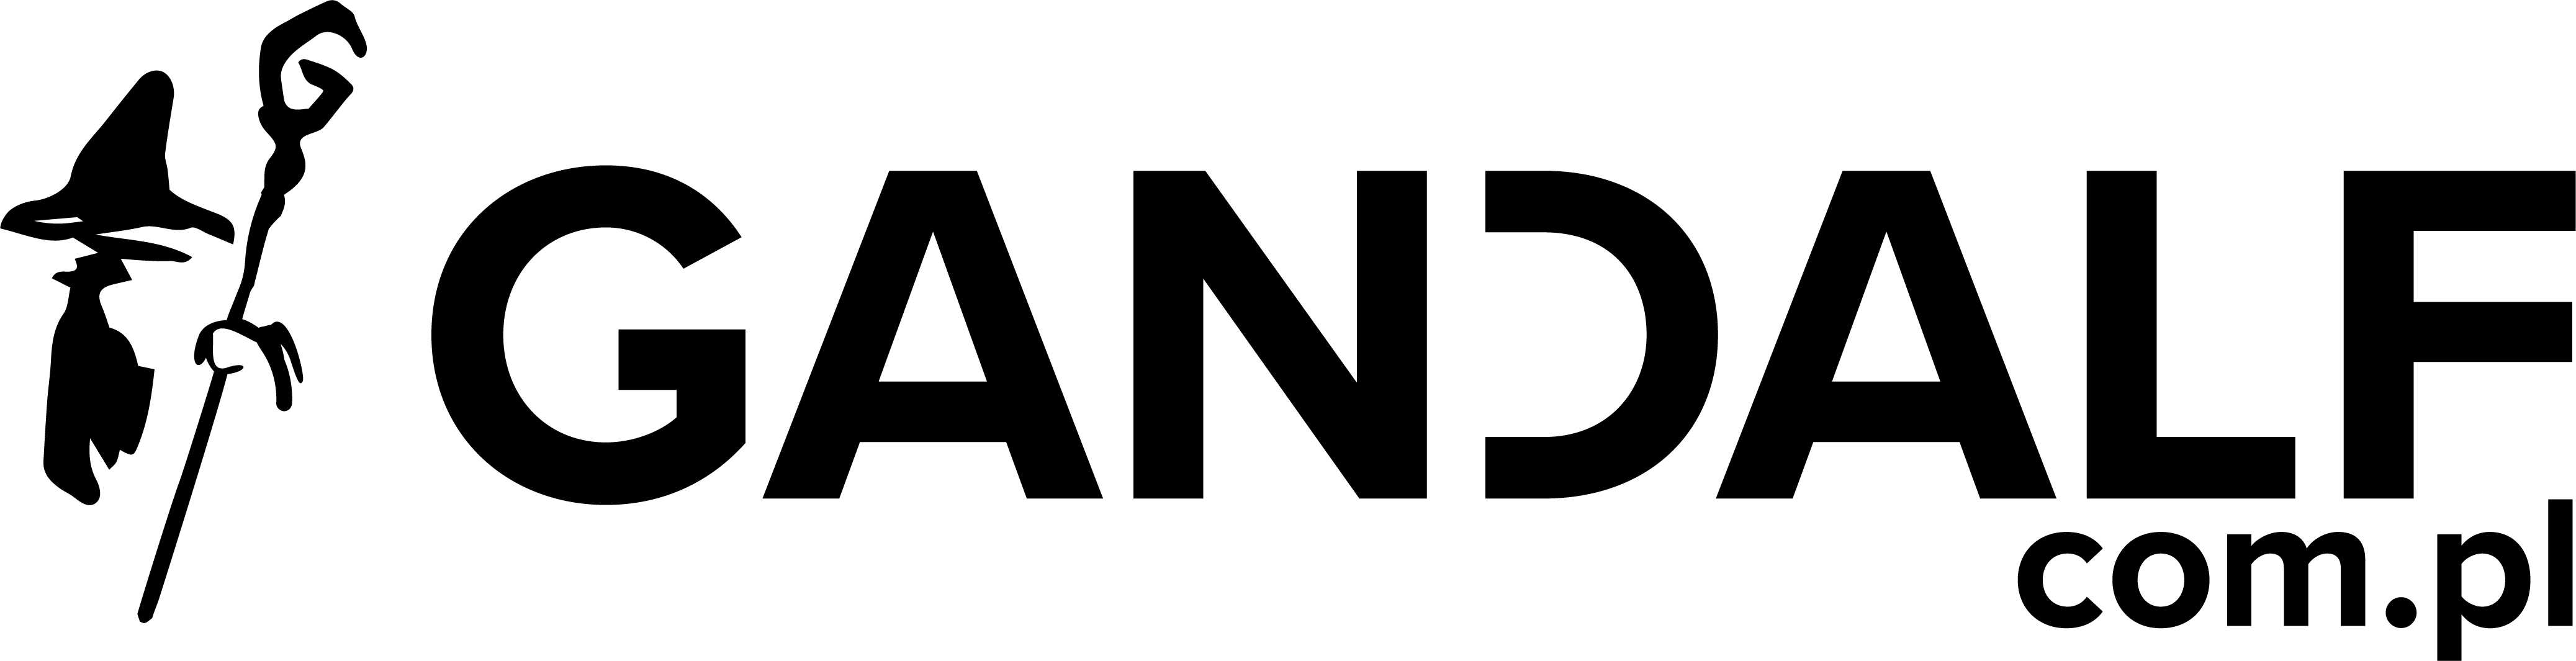 Gandalf.com.pl - reklama